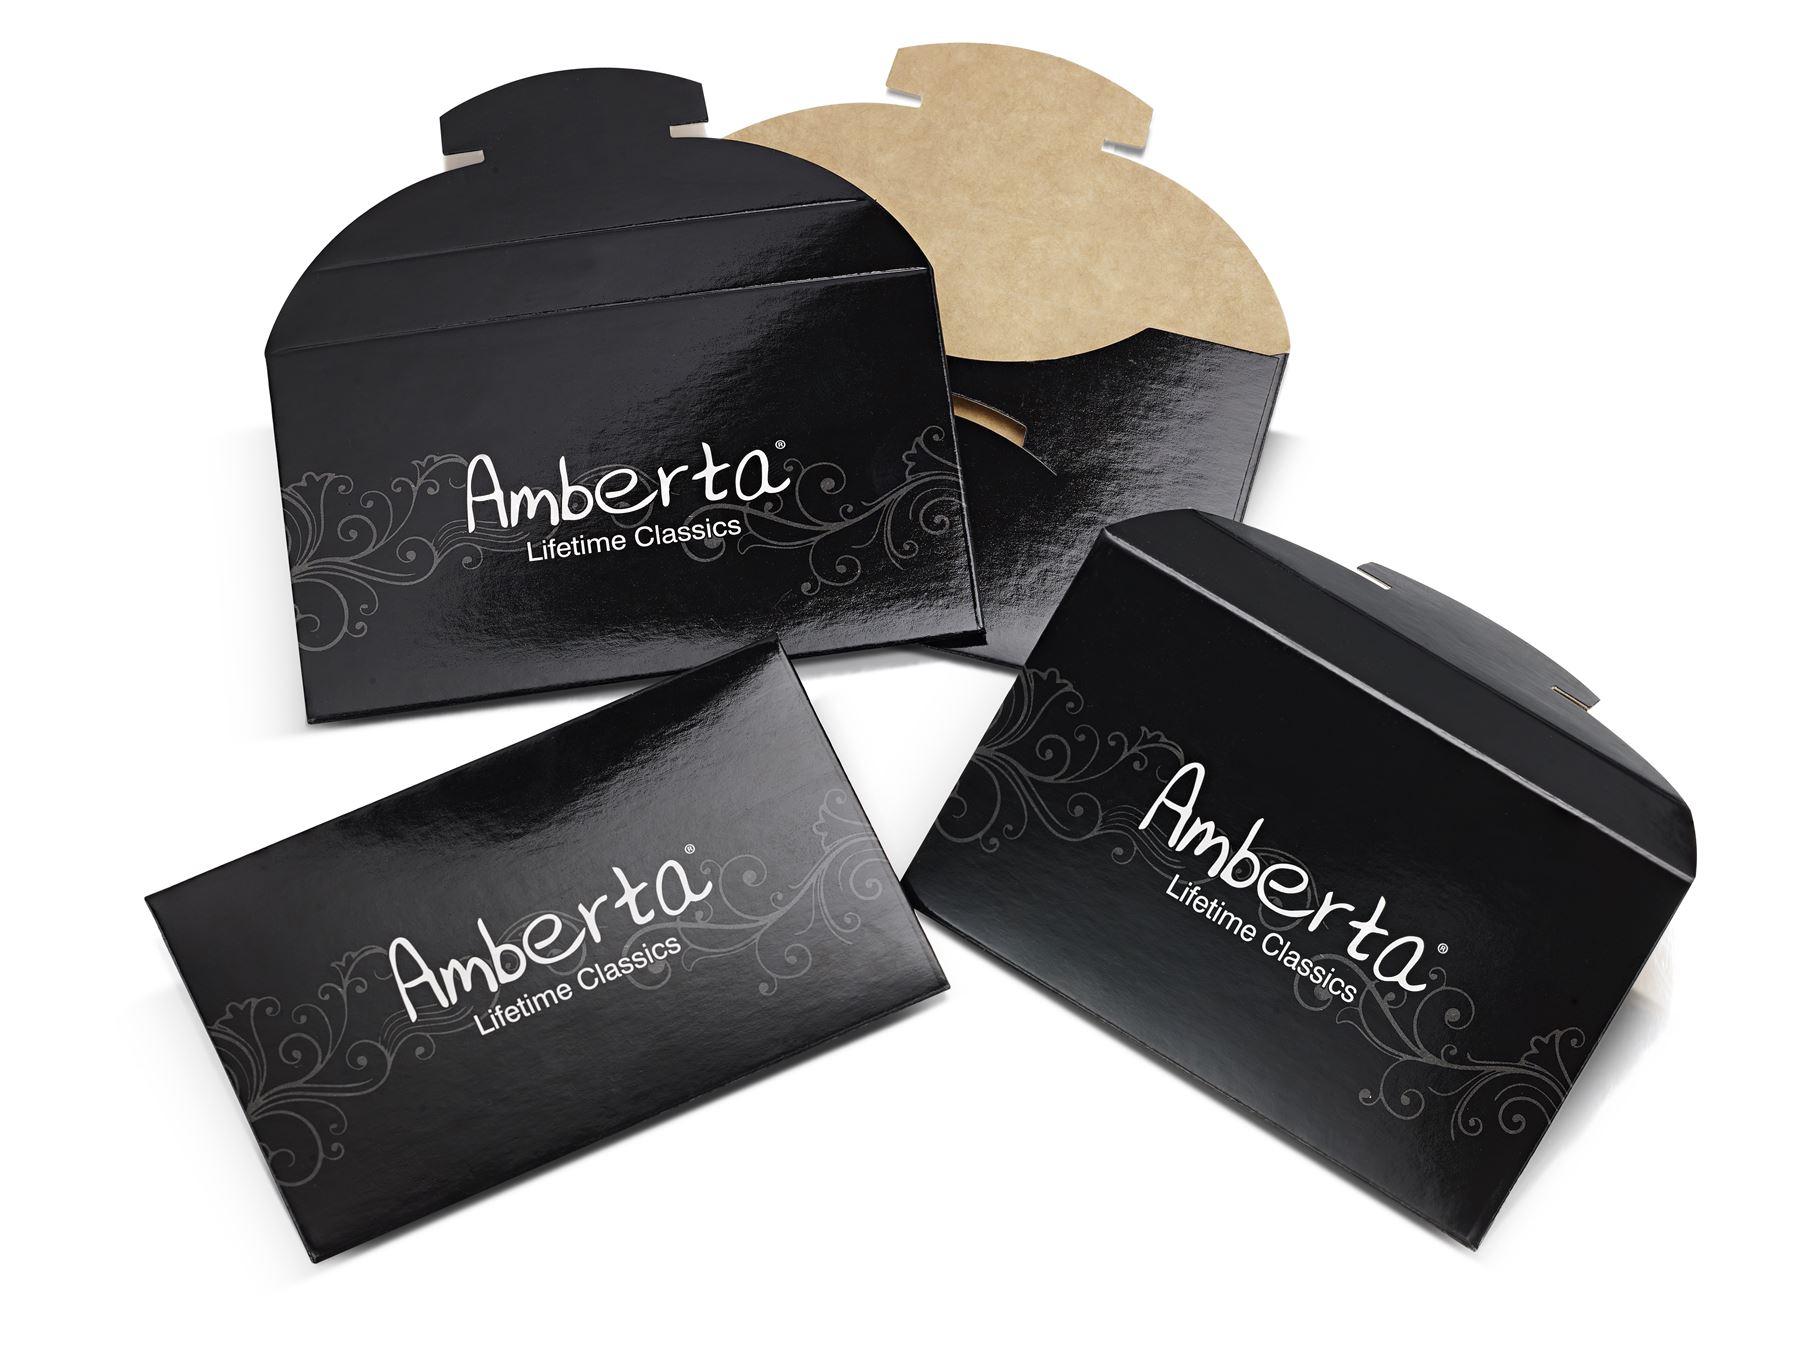 Amberta-Anillo-para-Pies-en-Plata-de-Ley-925-Anillo-Midi-Ajustable-para-Mujer miniatura 13